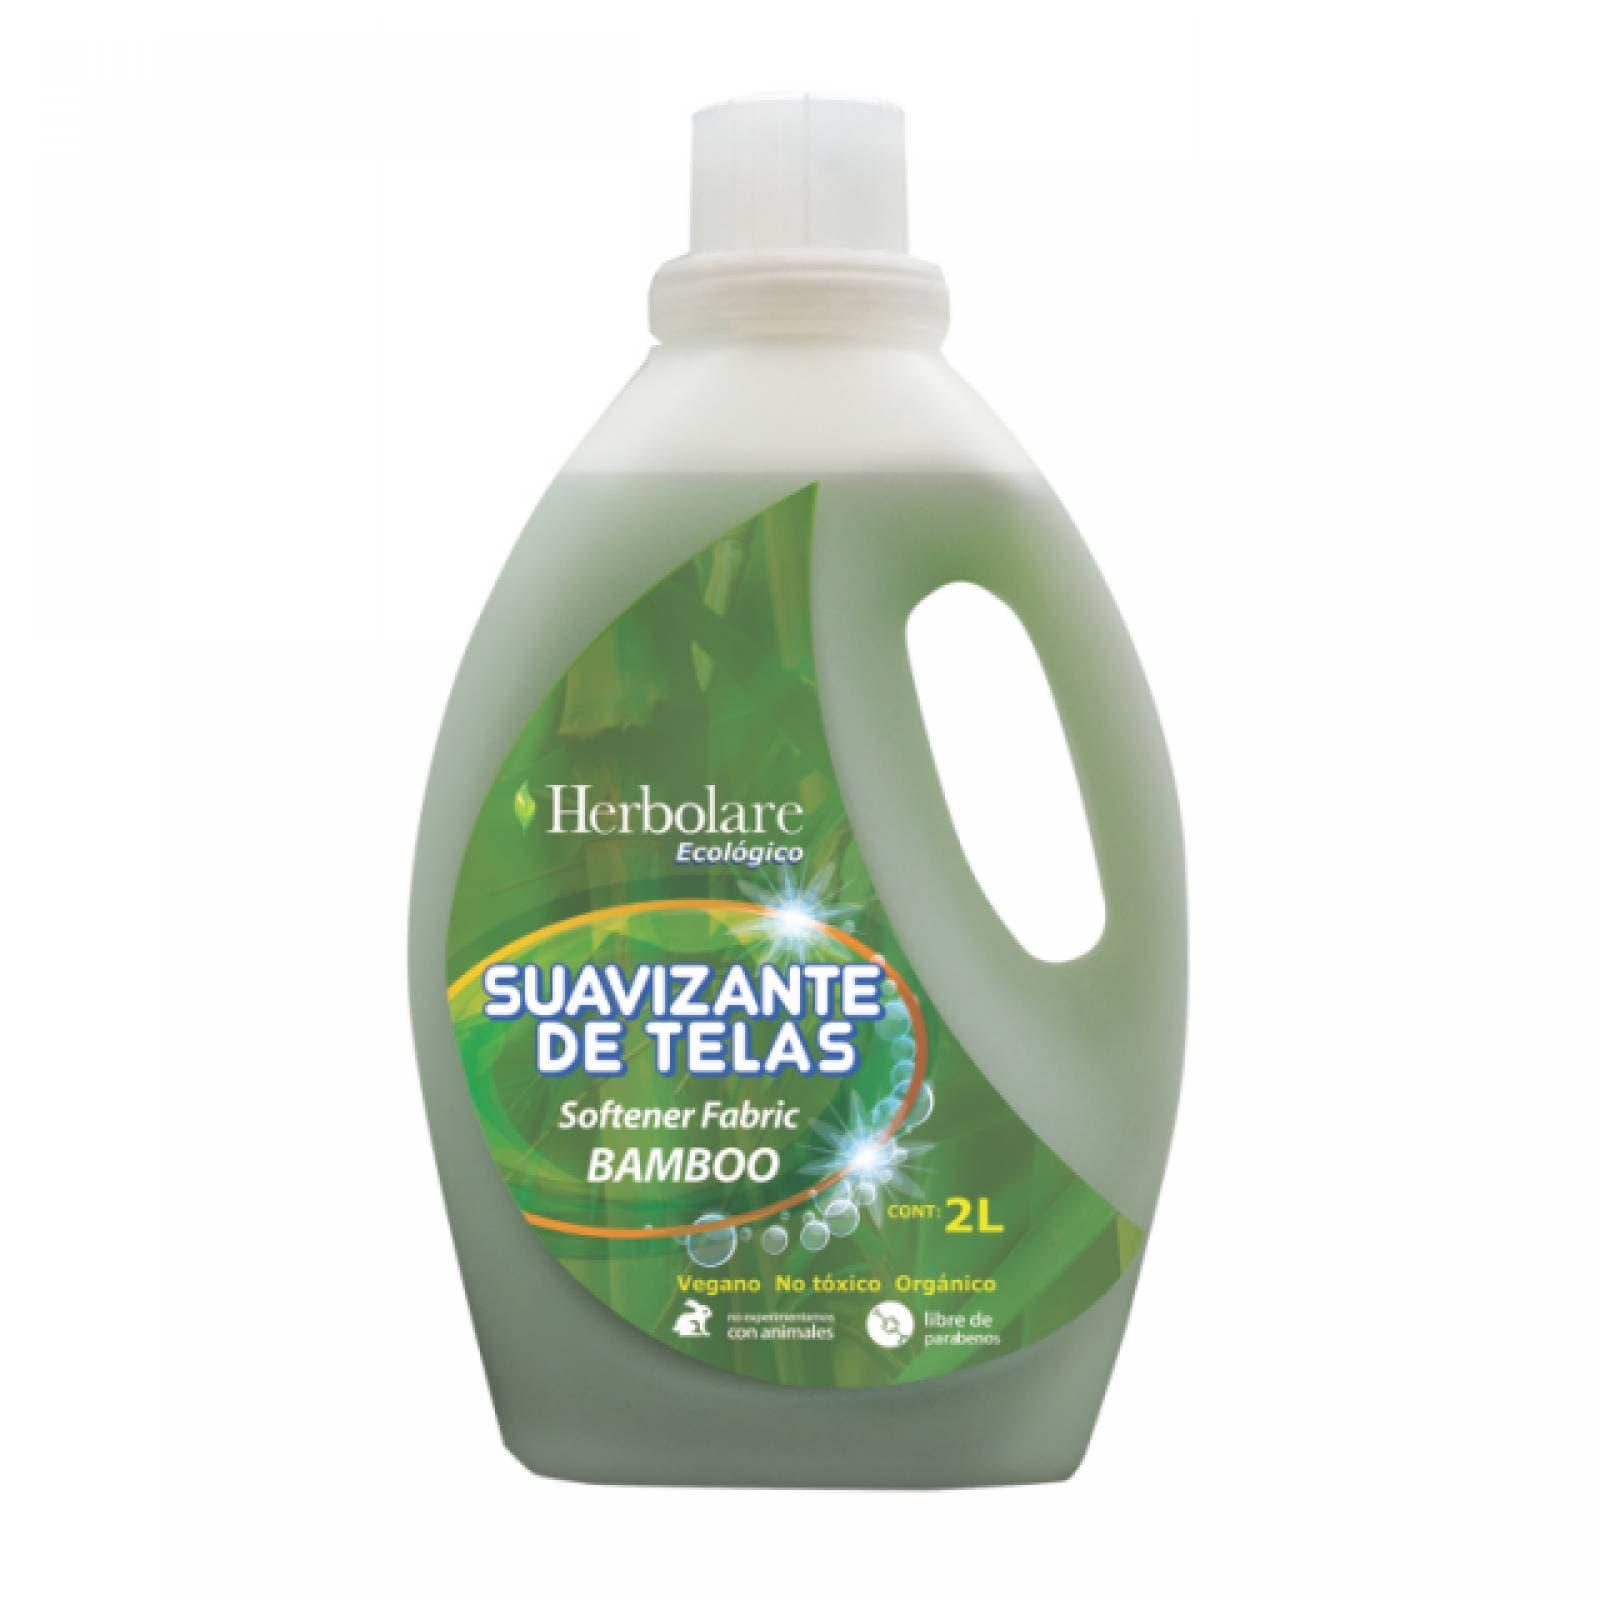 Suavizante Ropa Biodegradable Orgánico Herbolare Ecológico